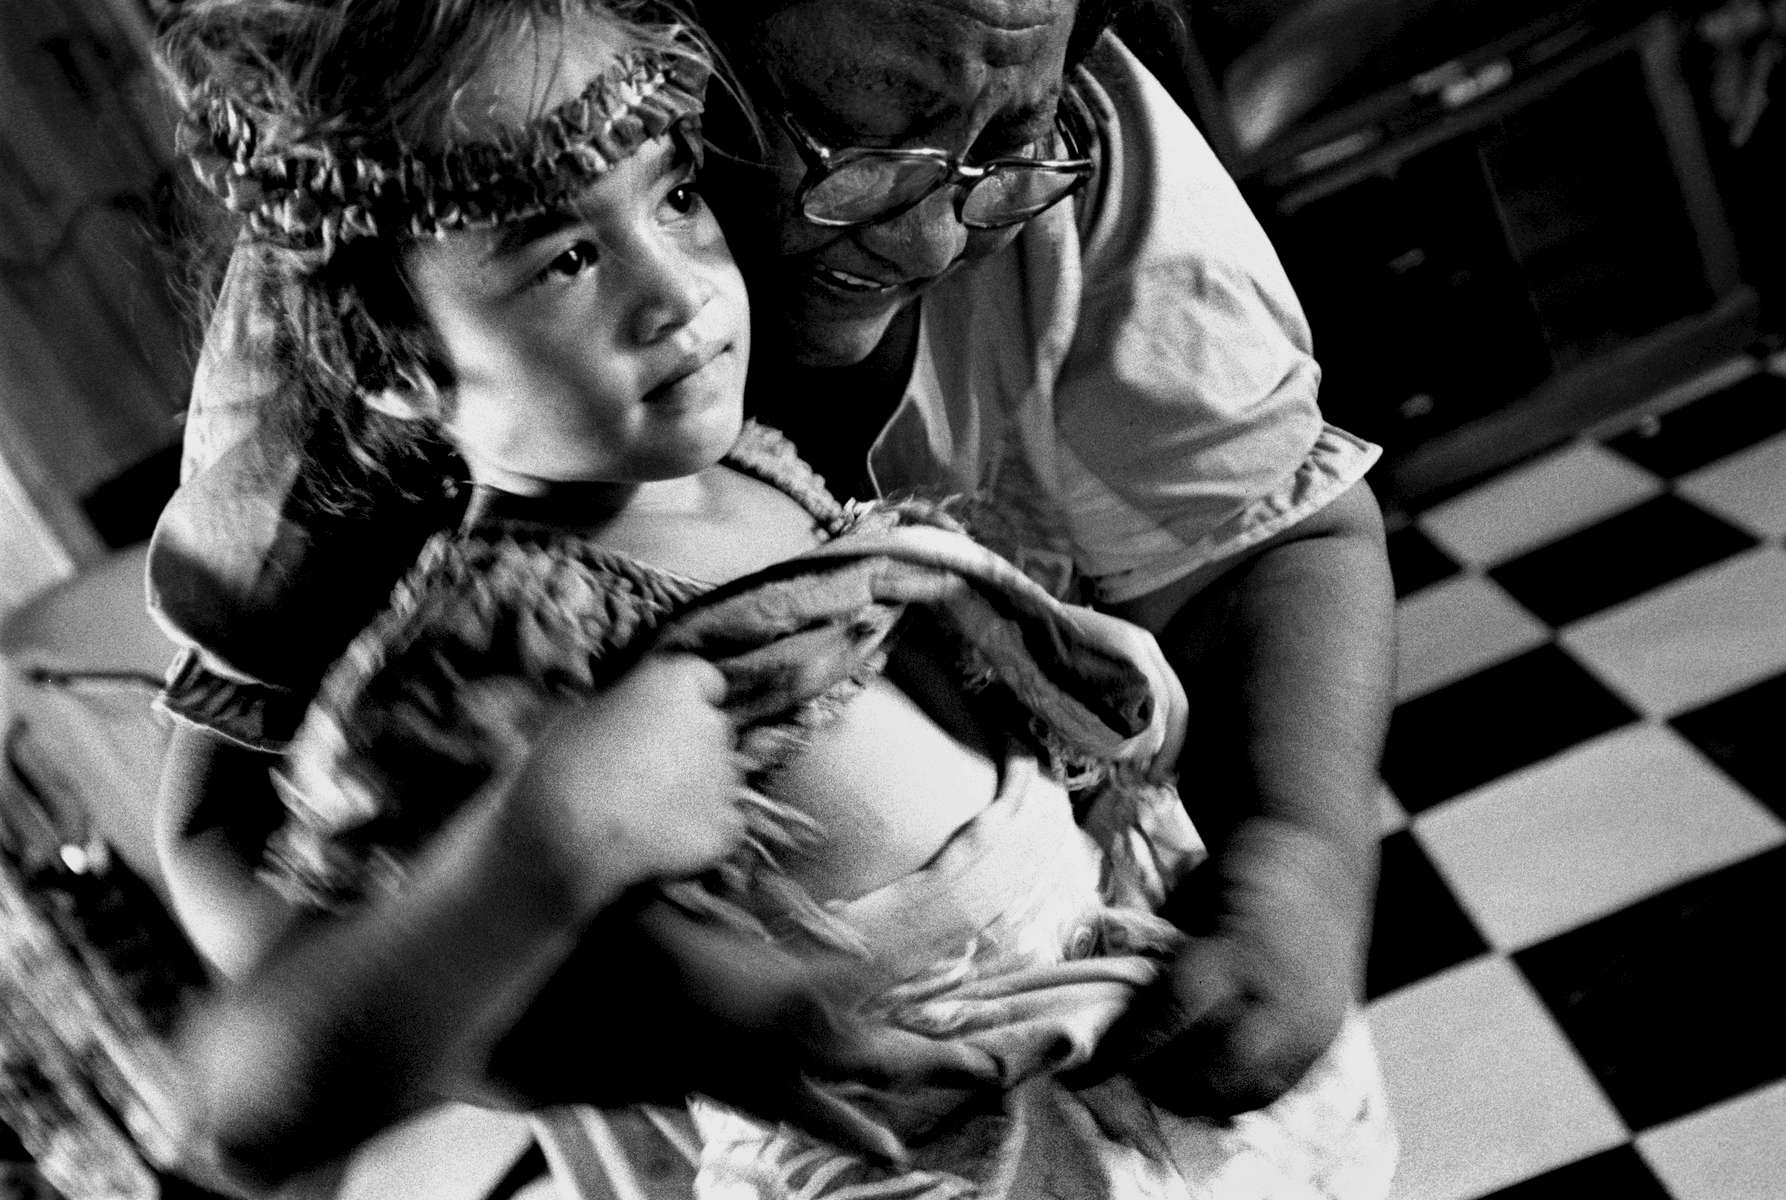 Grandmother helping her granddaughter get dressed for dance rehearsal, Nauru Island 2001